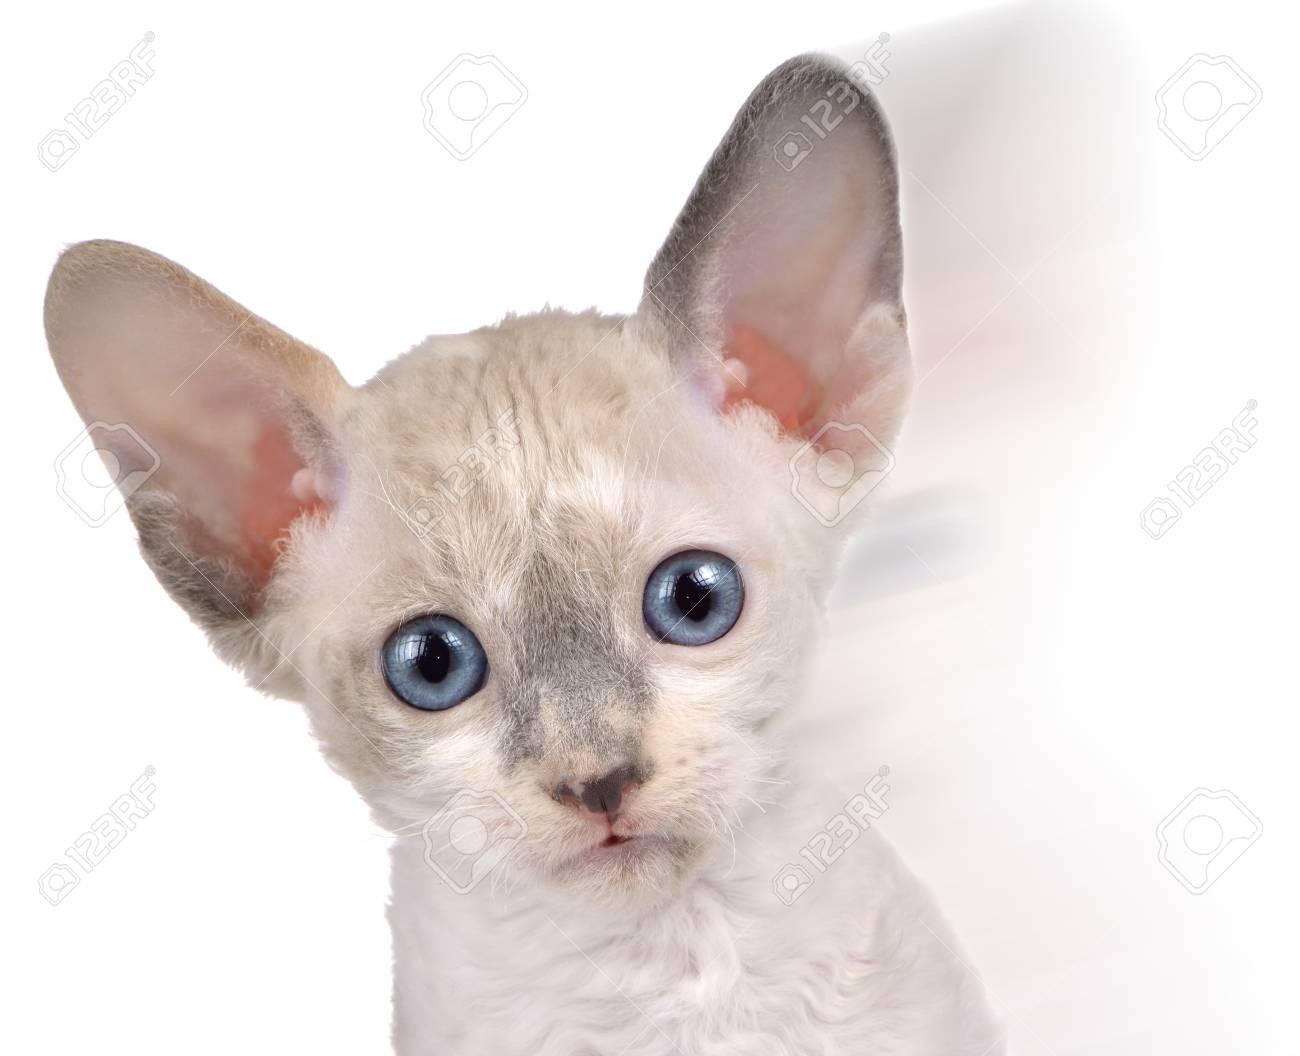 Cute Little White Cornish Rex Kitten in Motion Stock Photo - 17609031